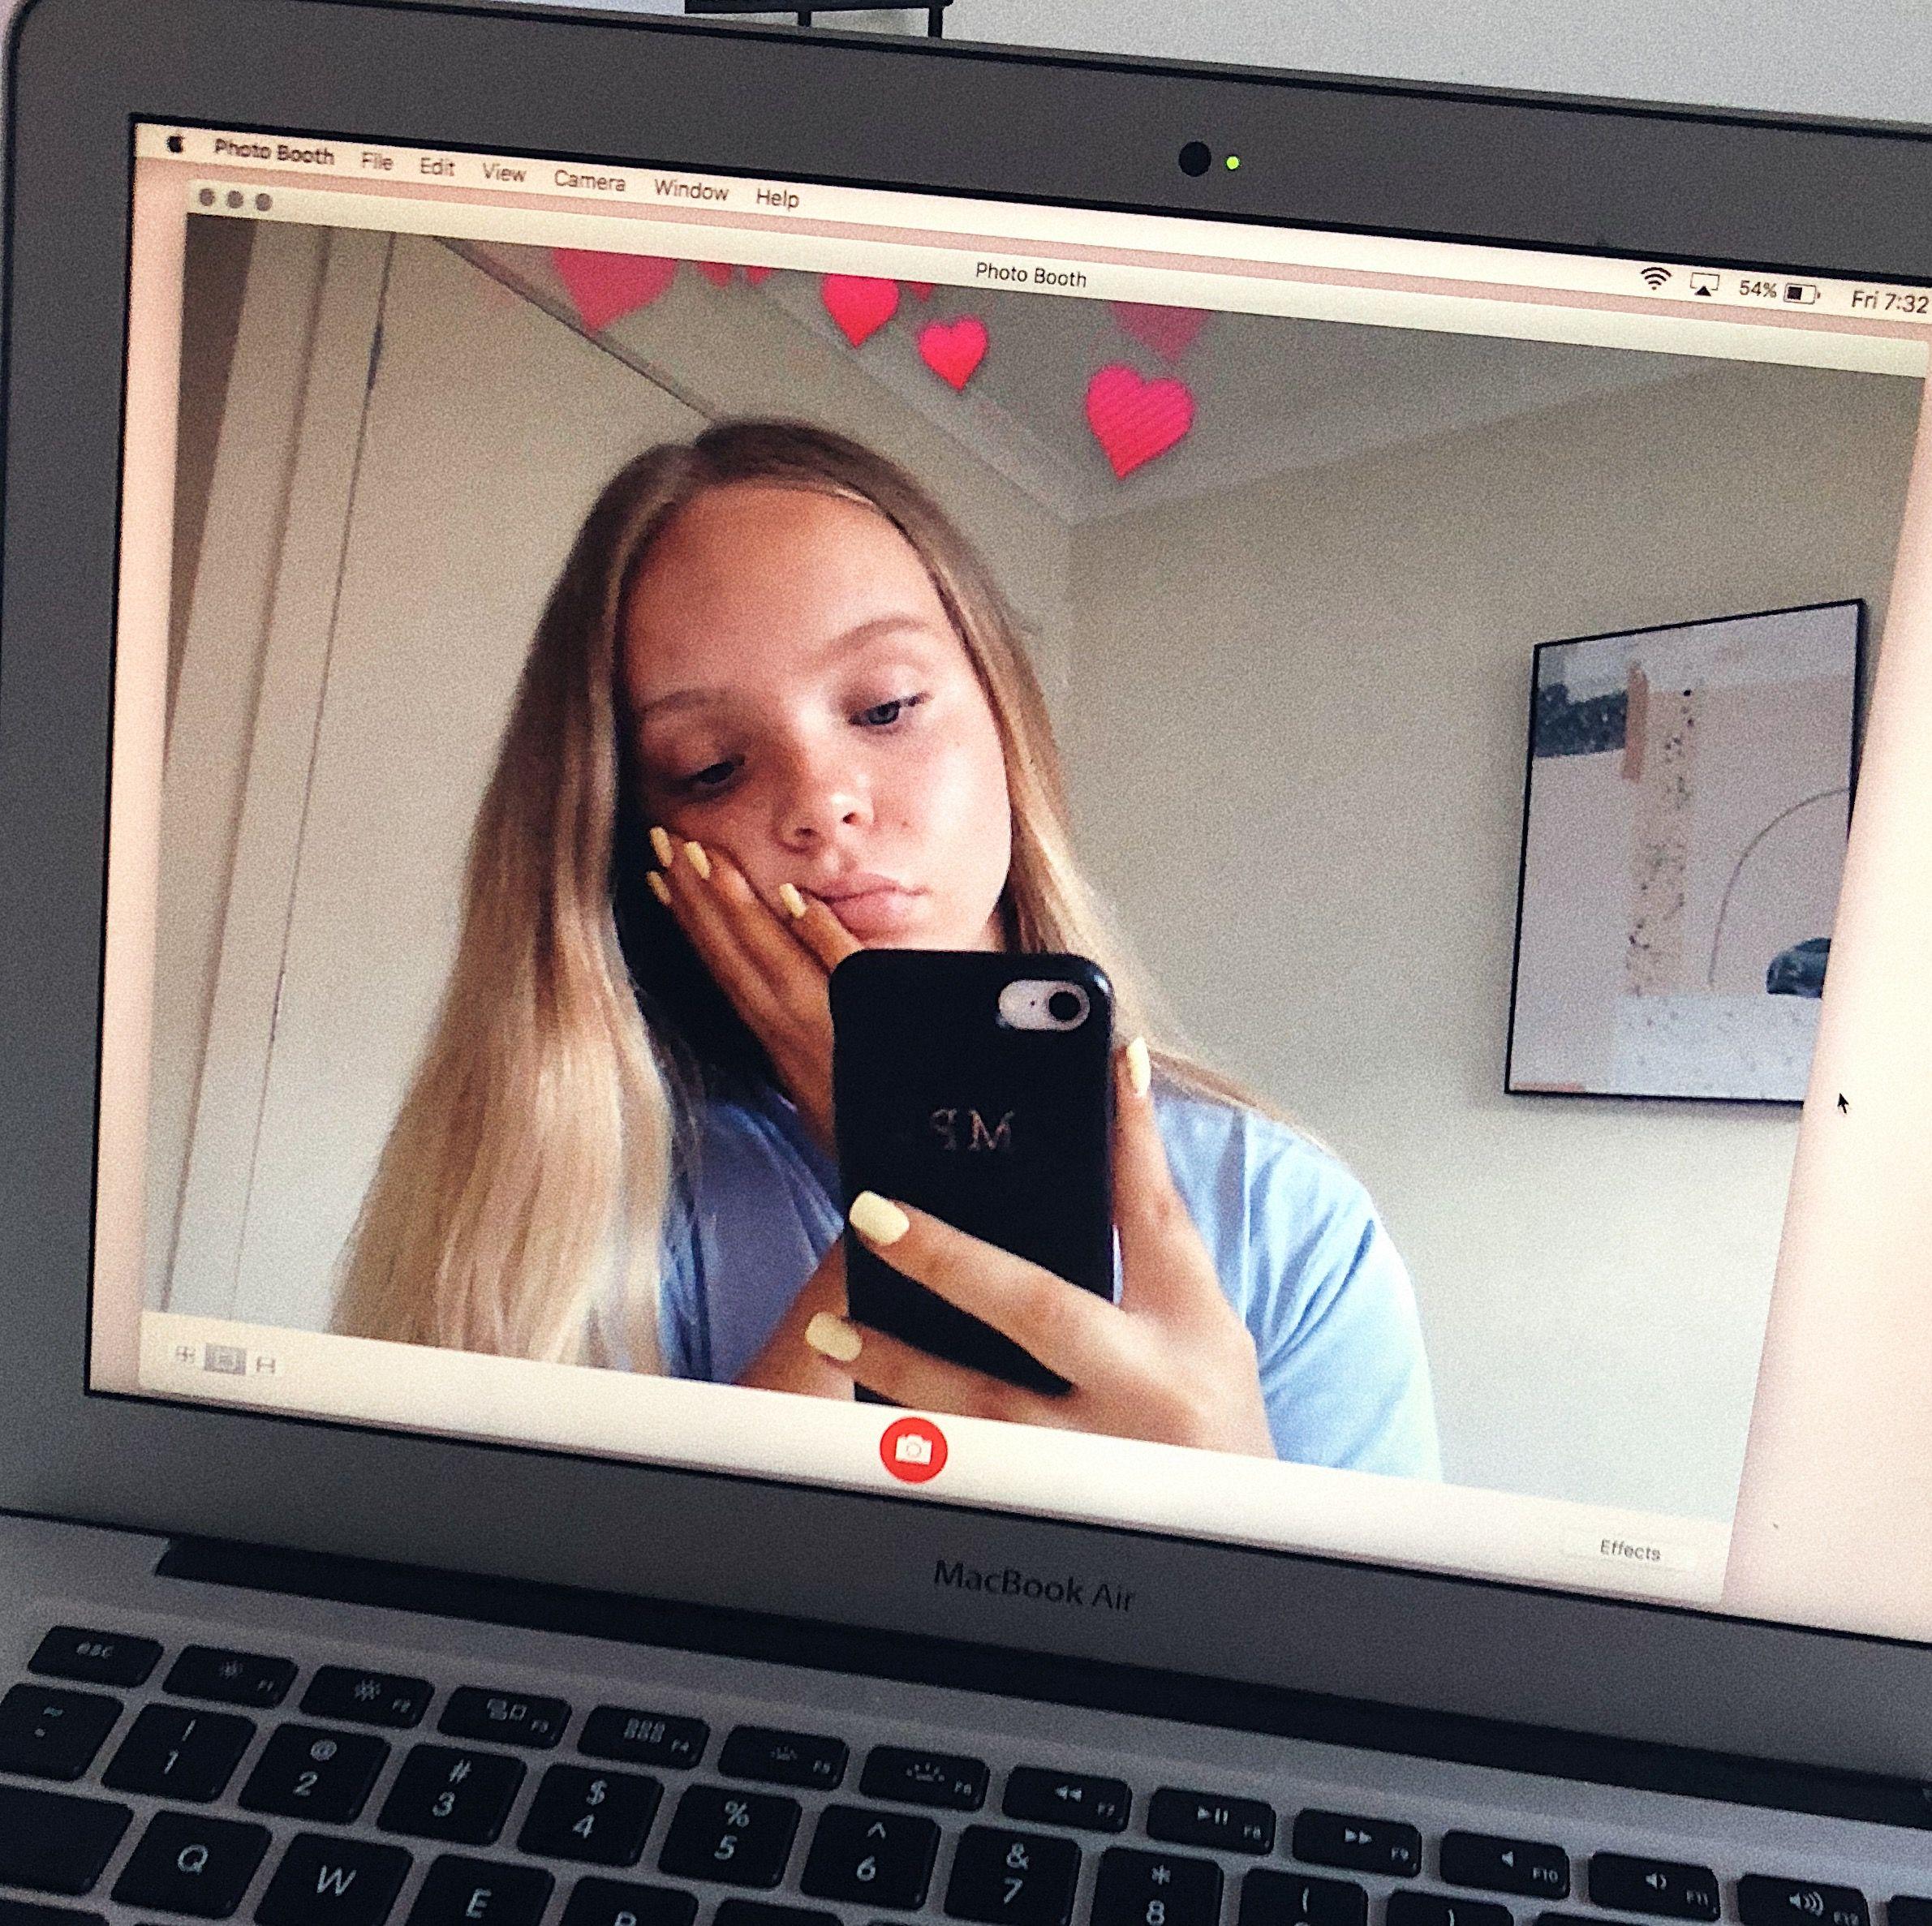 Pin By Zehra Ozdemir On Tumblr In 2020 Camera Selfie Macbook Macbook Wallpaper